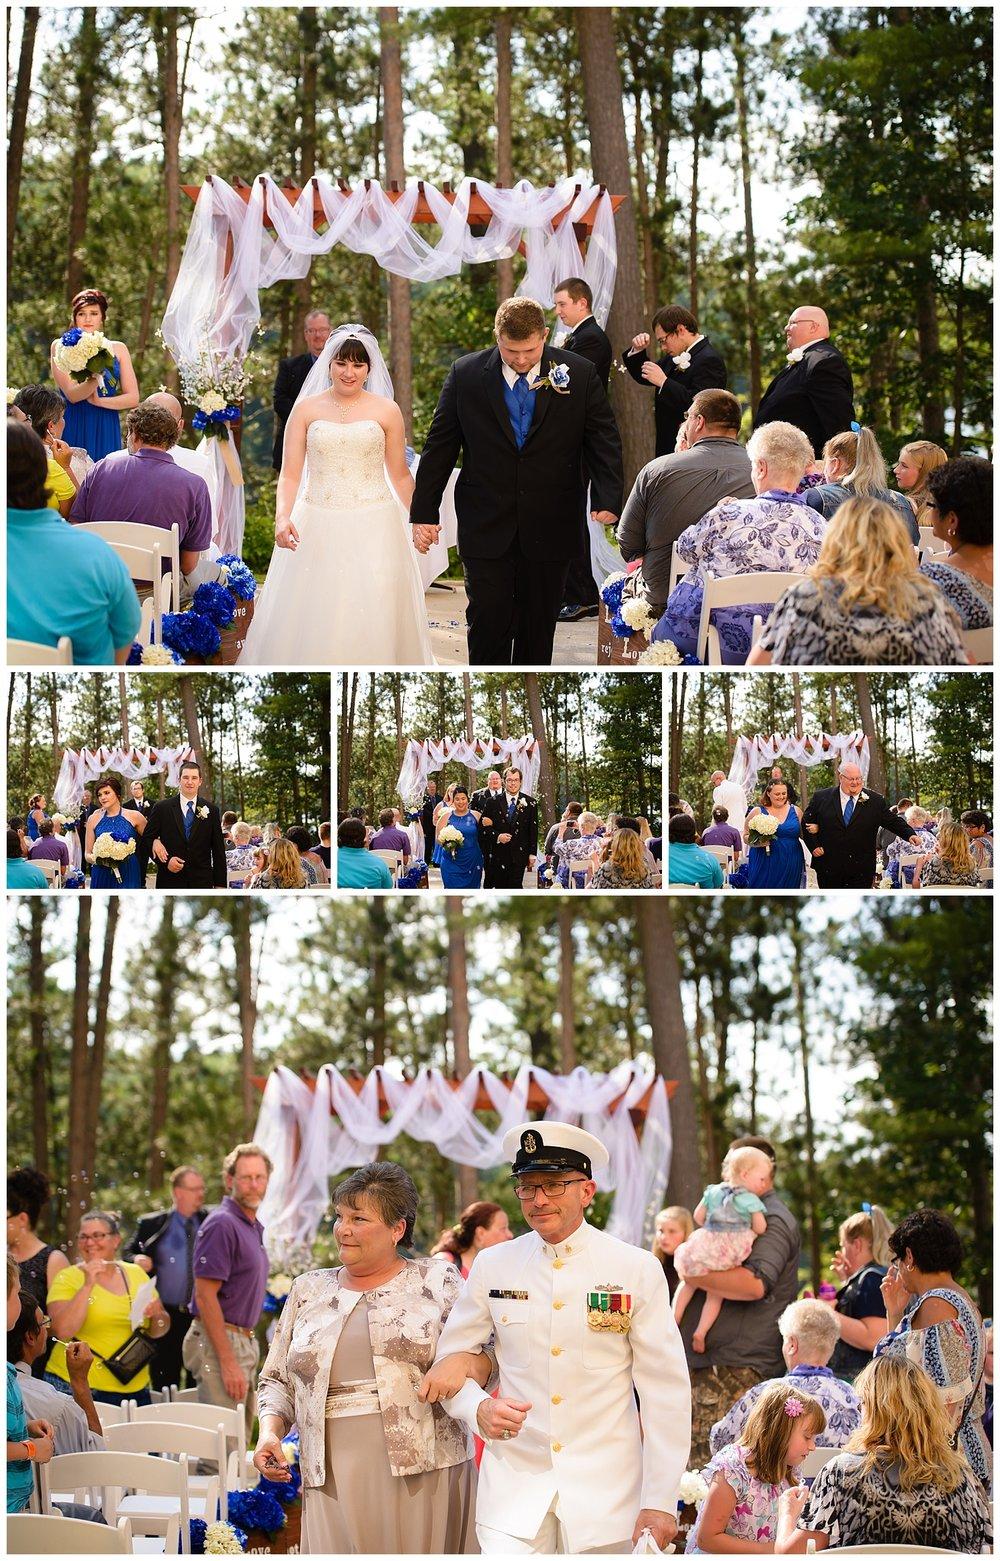 chula vista resort wedding wisconsin dells wisconsin ps 139 photography_0016.jpg